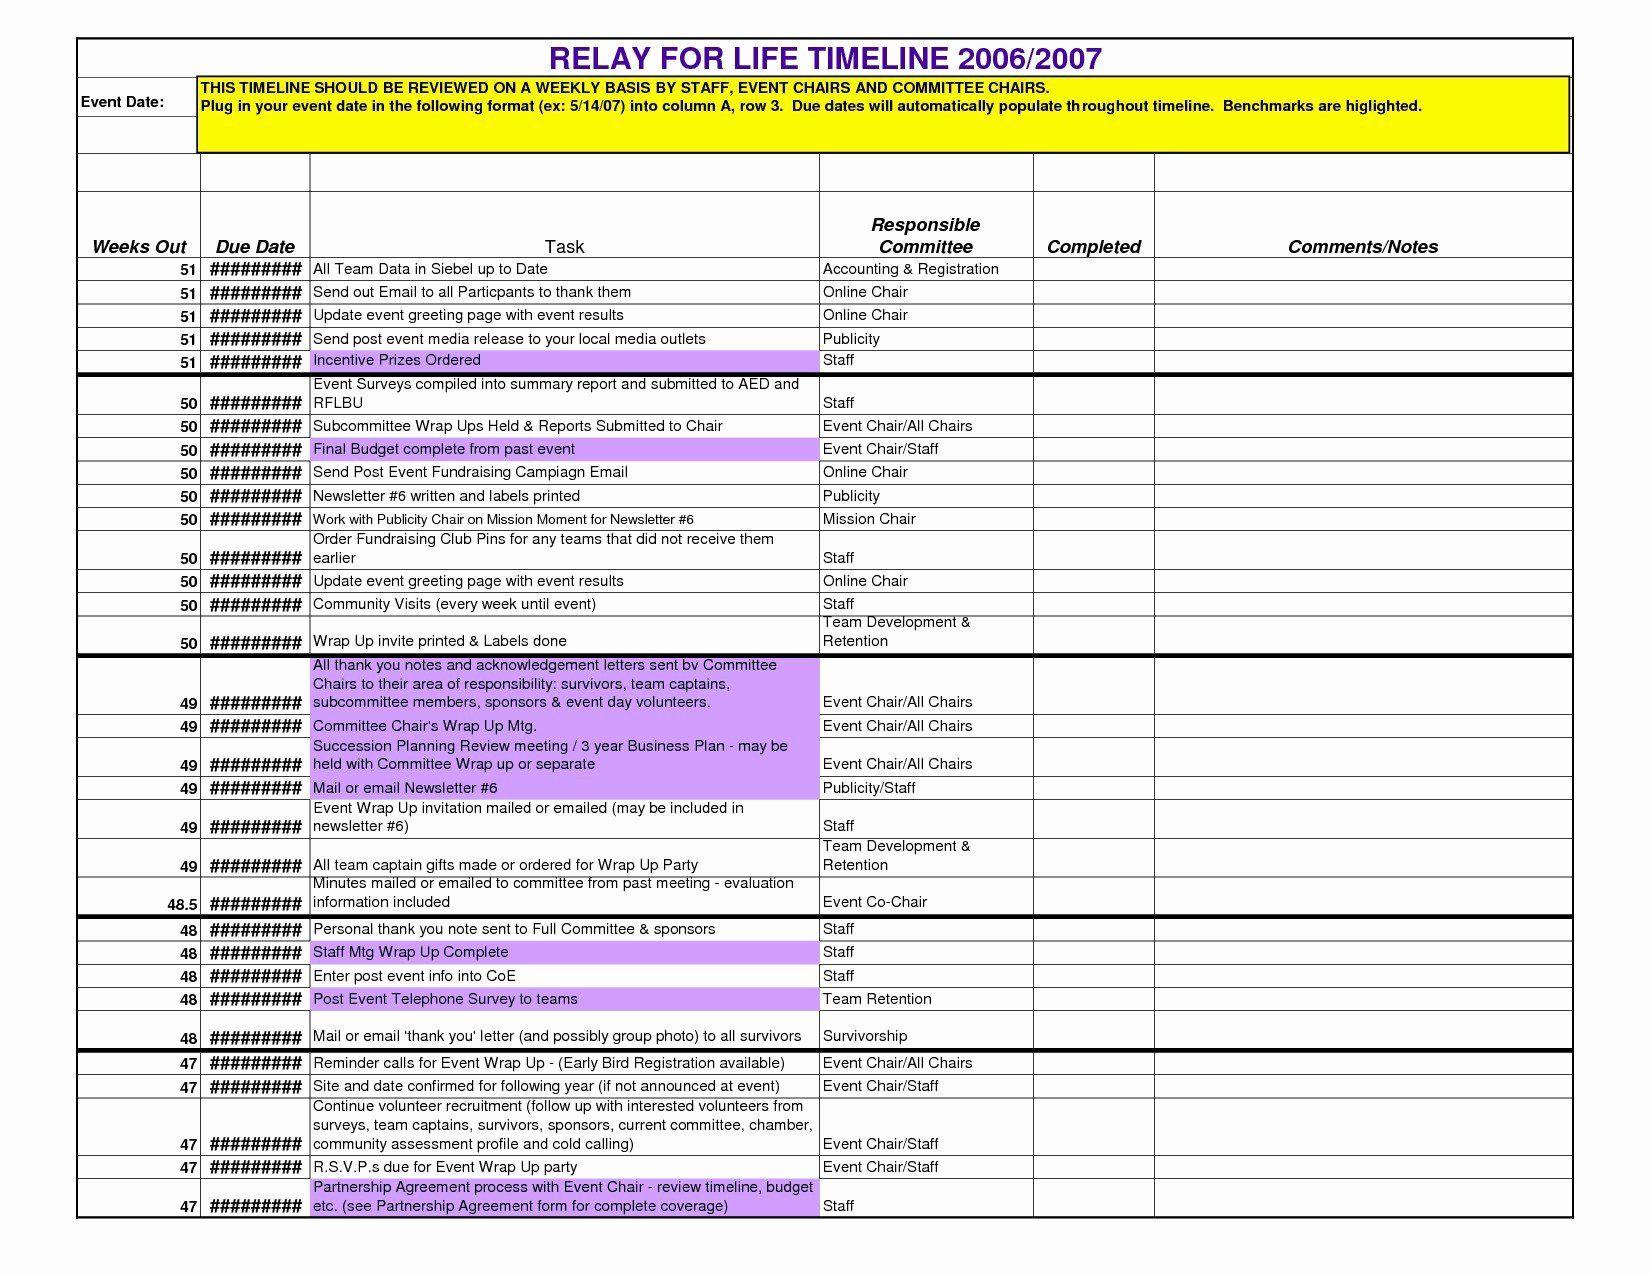 Event Planning Timeline Template Unique Timeline Spreadsheet Template Excel Spreadsheet In 2021 Event Planning Timeline Event Planning Proposal Event Planning Template